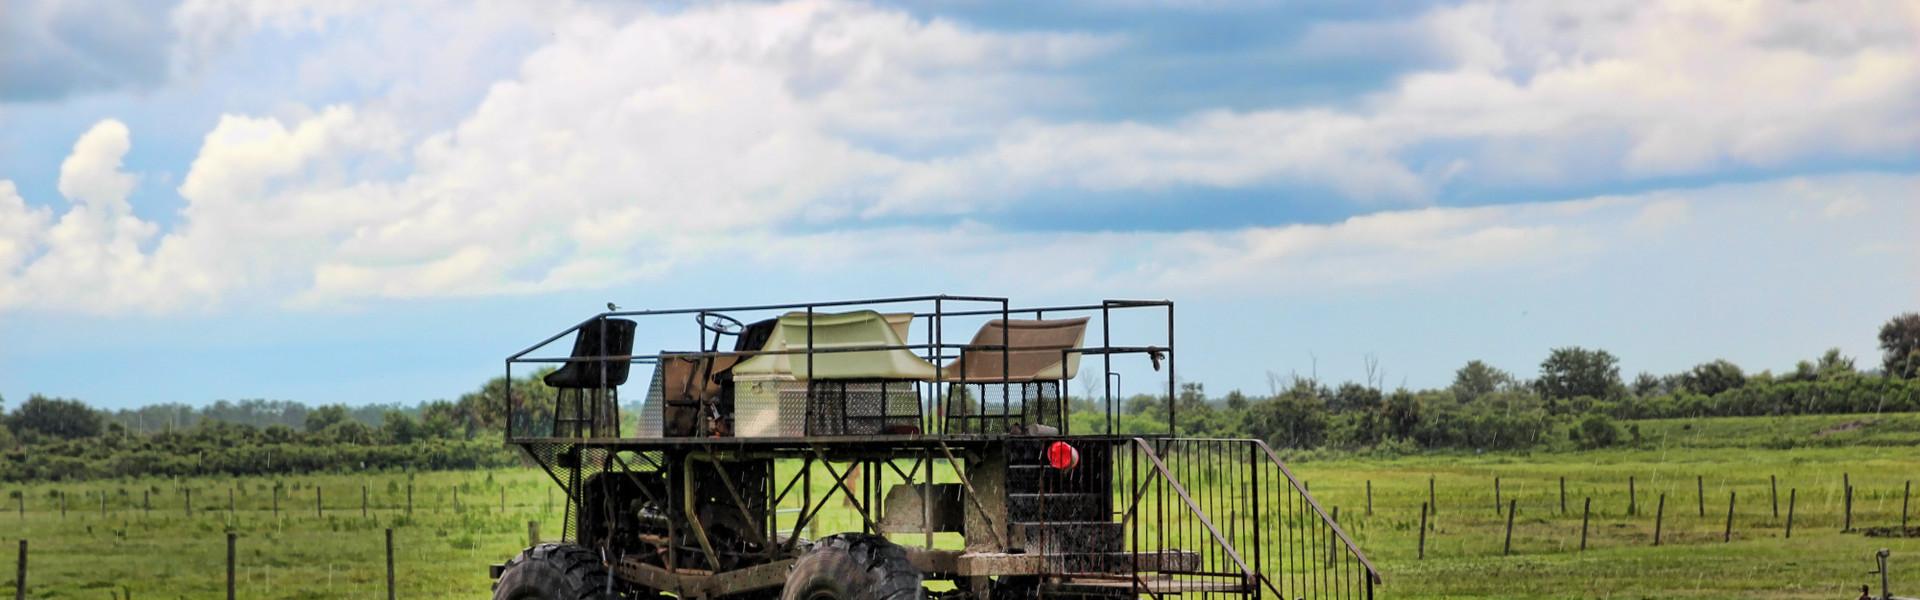 Swamp Buggy Rides near Orlando, FL | Swamp Buggy at the Ranch